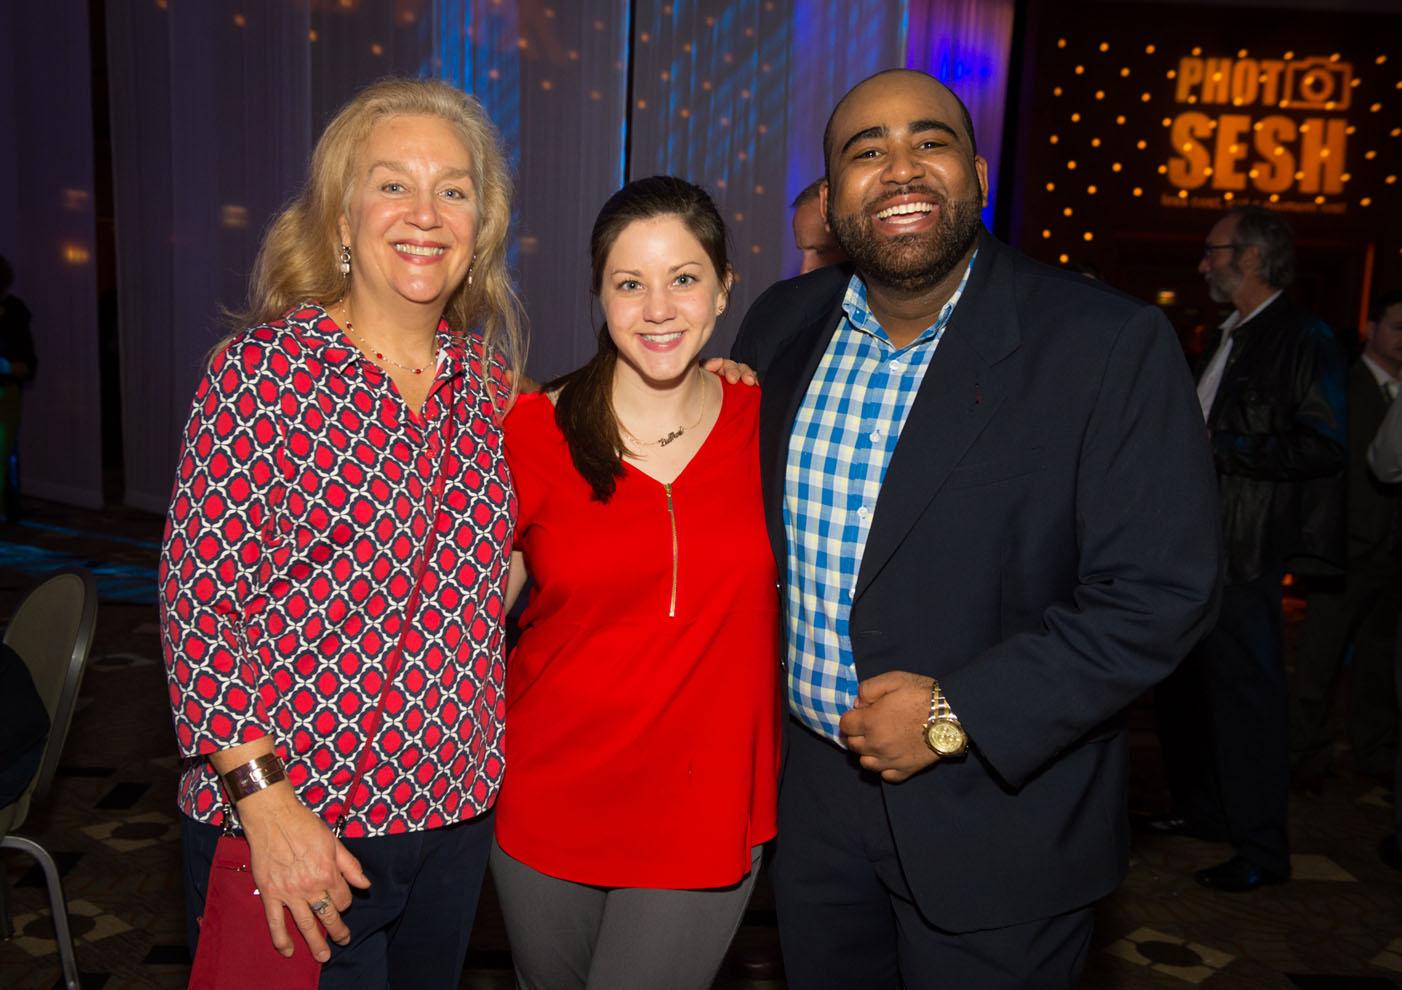 2015-12-09 ReMax Corpoarte Event - The Borgata - Atlantic City NJ - Photo Sesh - 2015-5087.jpg